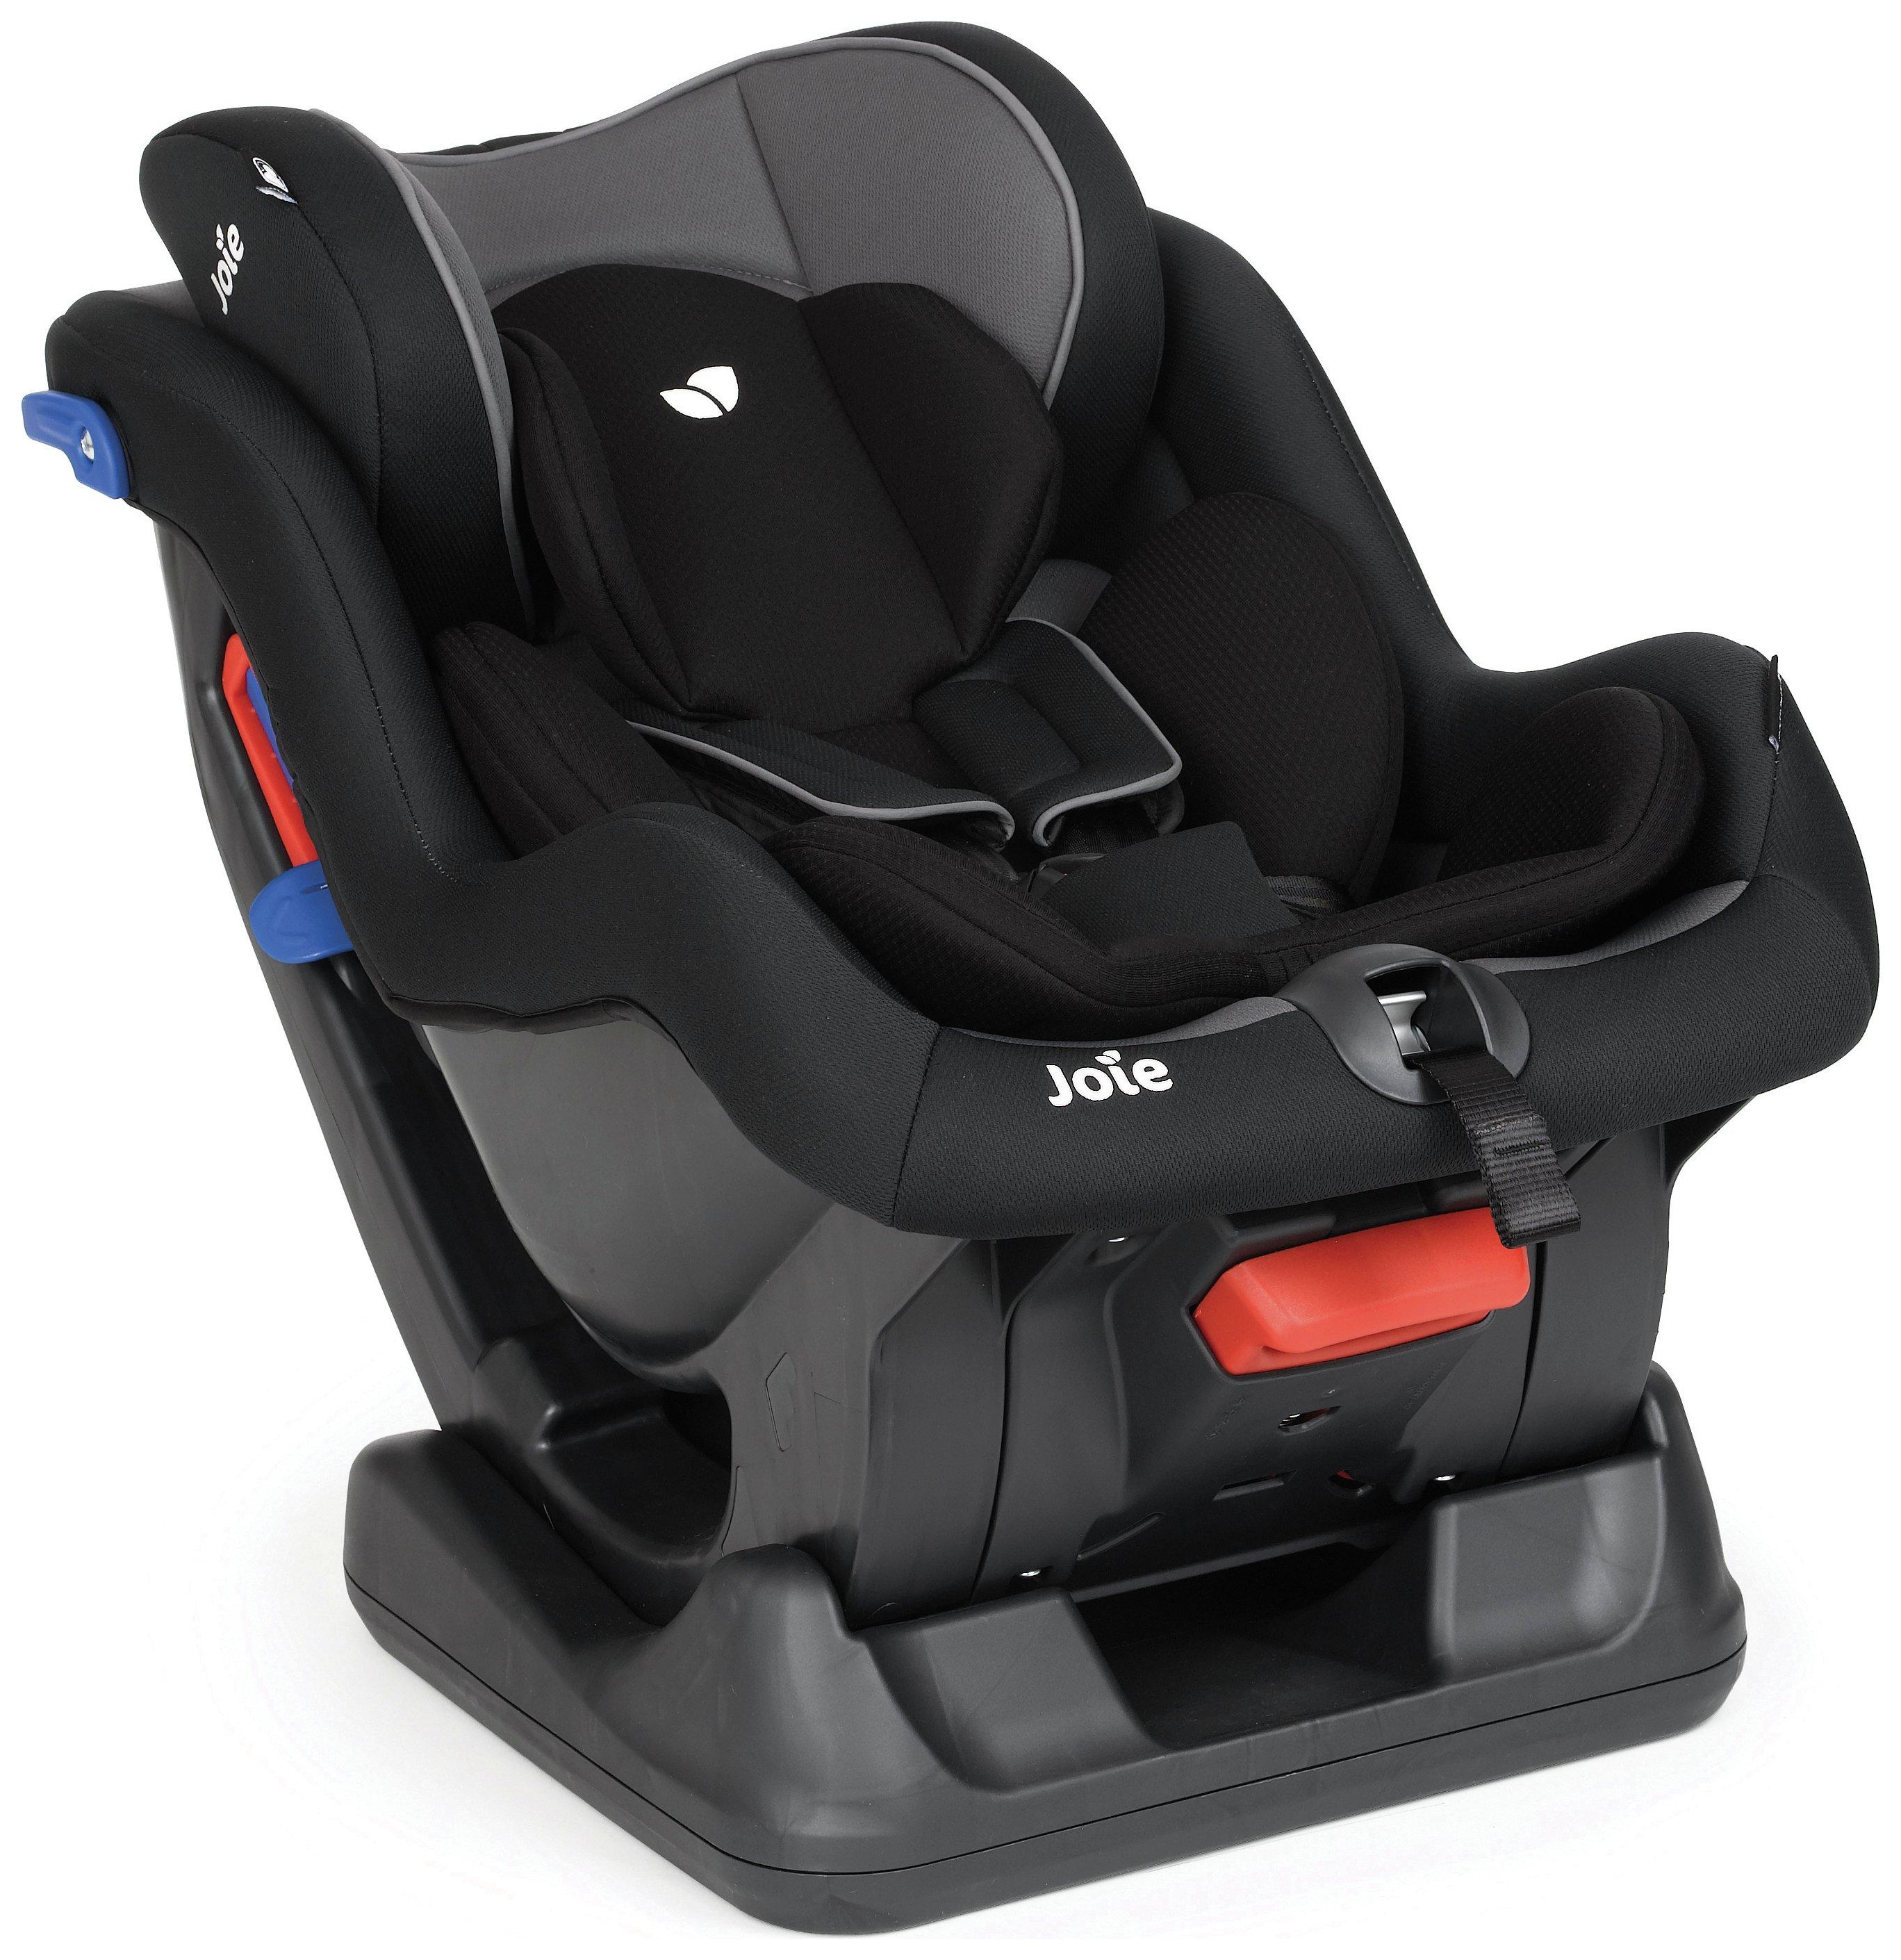 Joie Steadi Group 0+/1 Car Seat - Moonlight